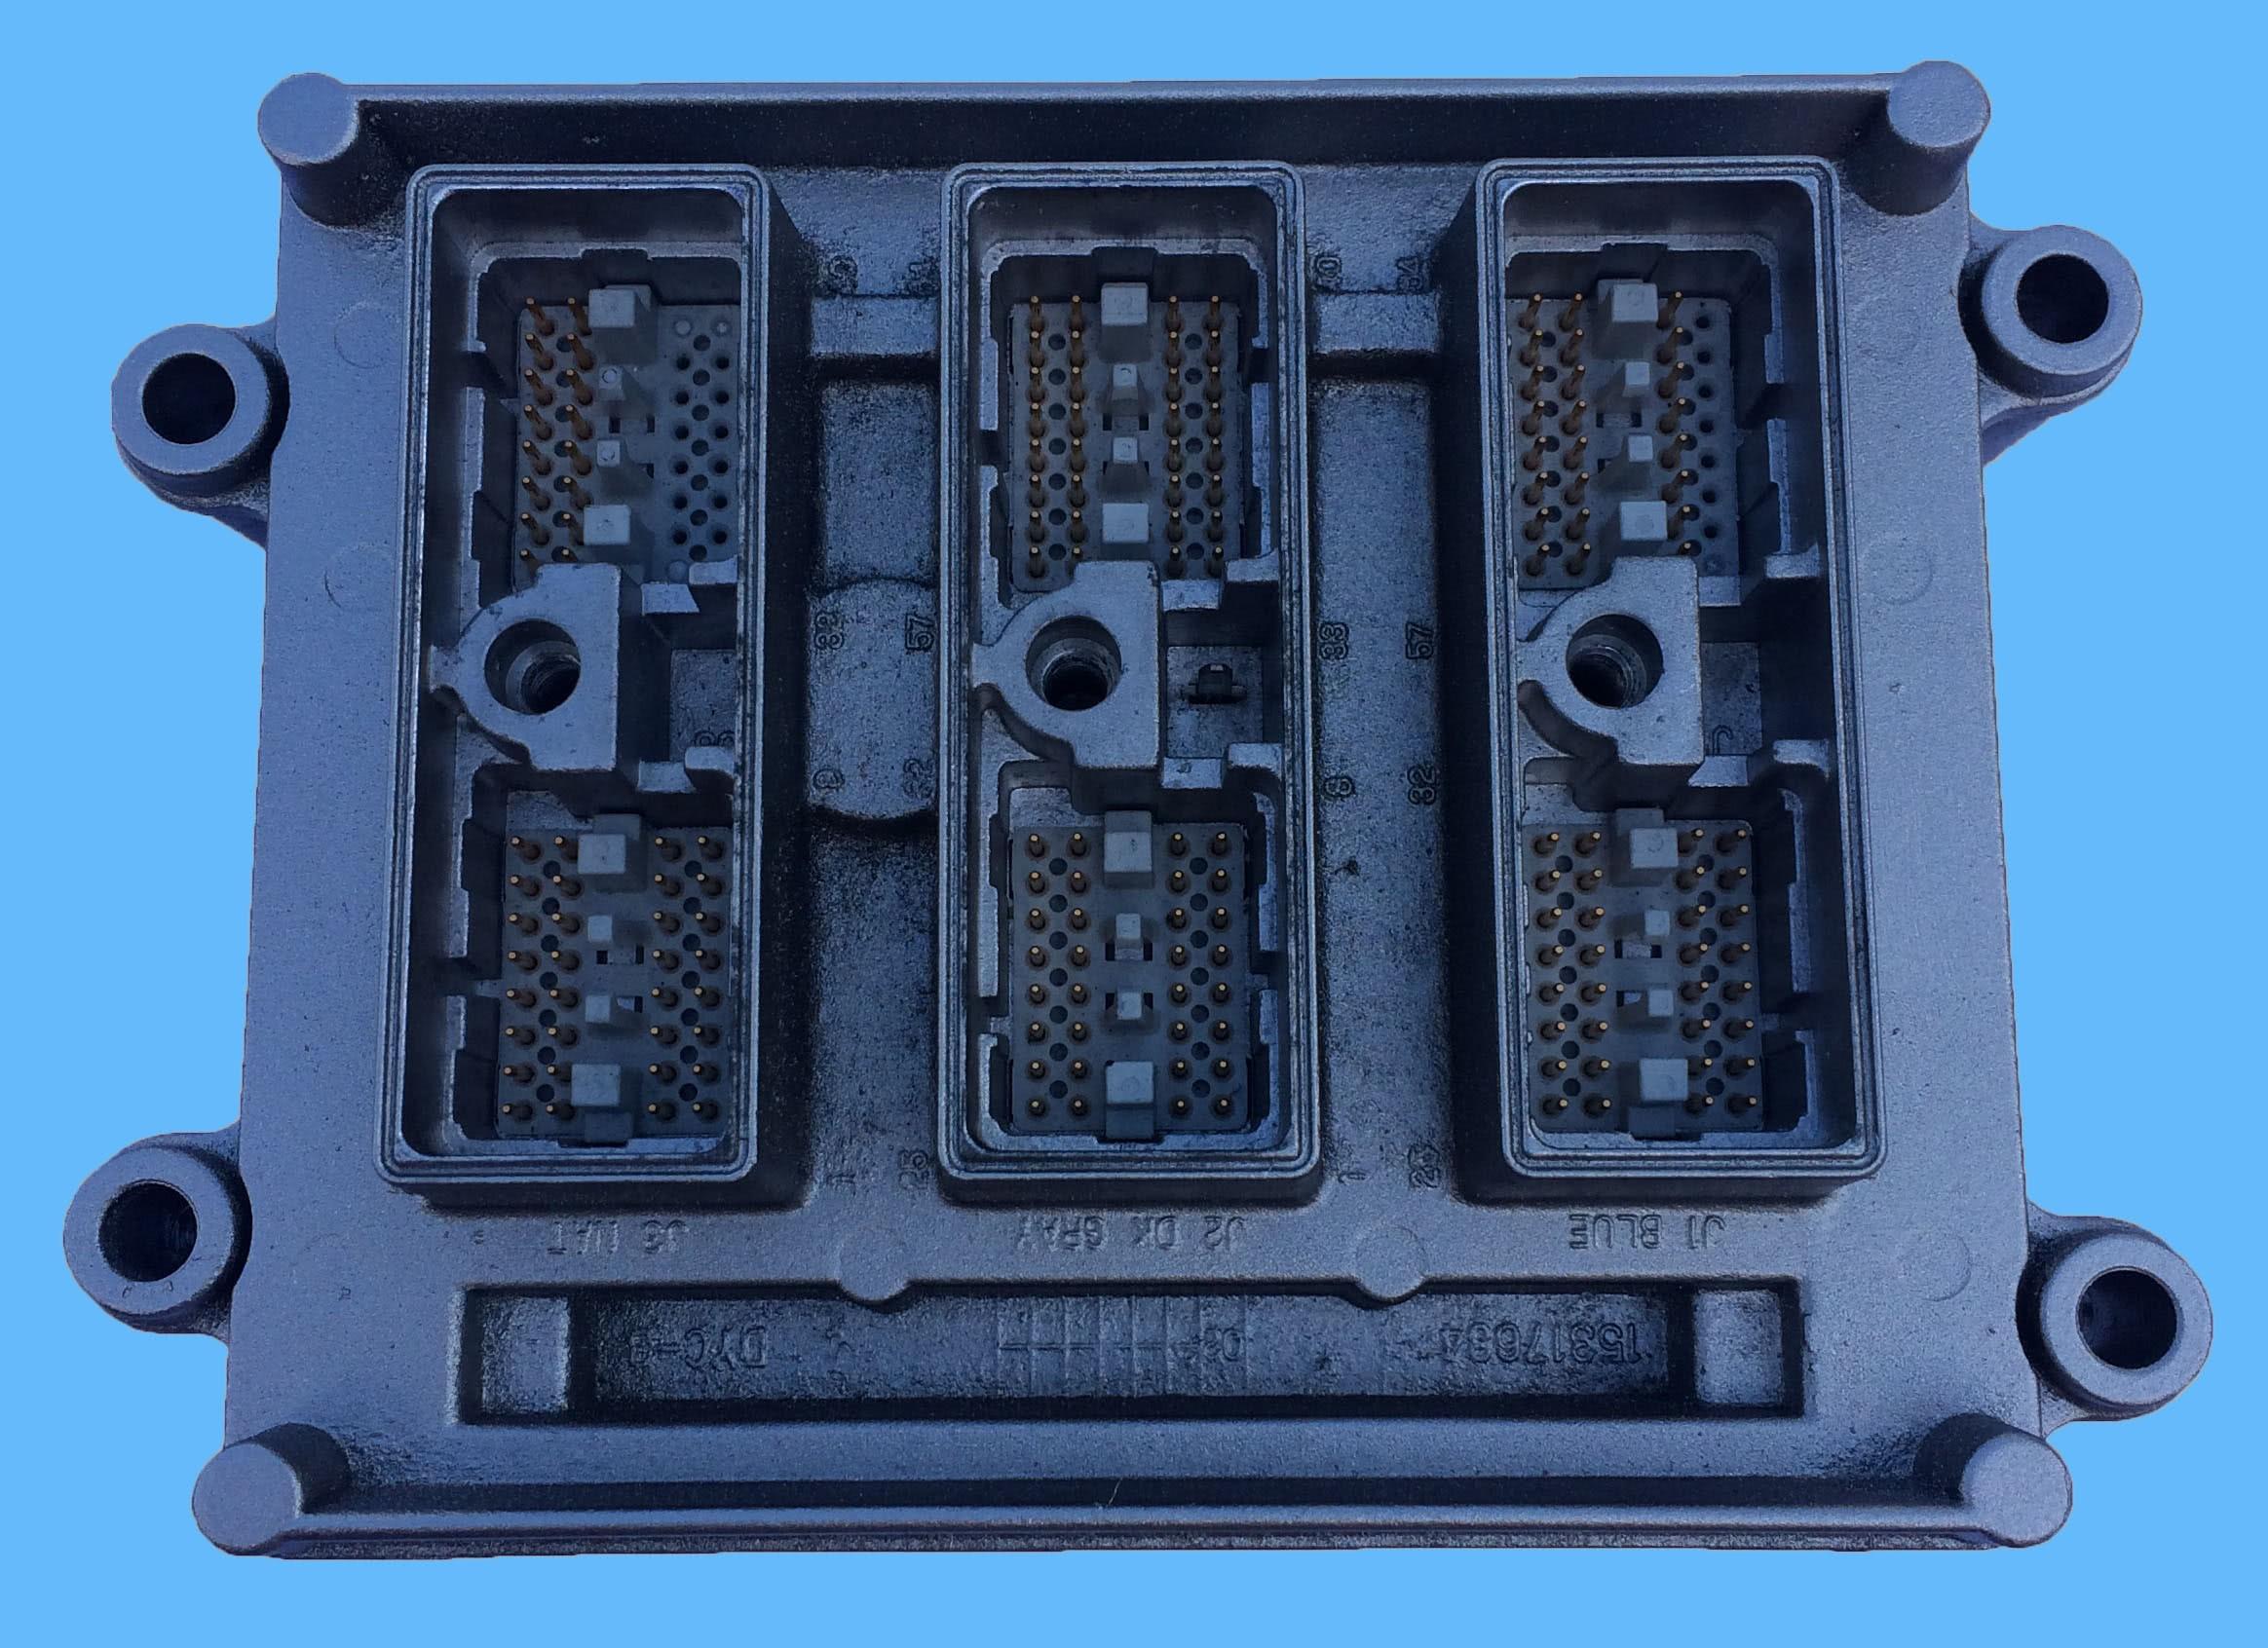 2005 Chevrolet Trailblazer 4.3L V6 Gas Engine Control Module ECM / ECU - Engine Control Module